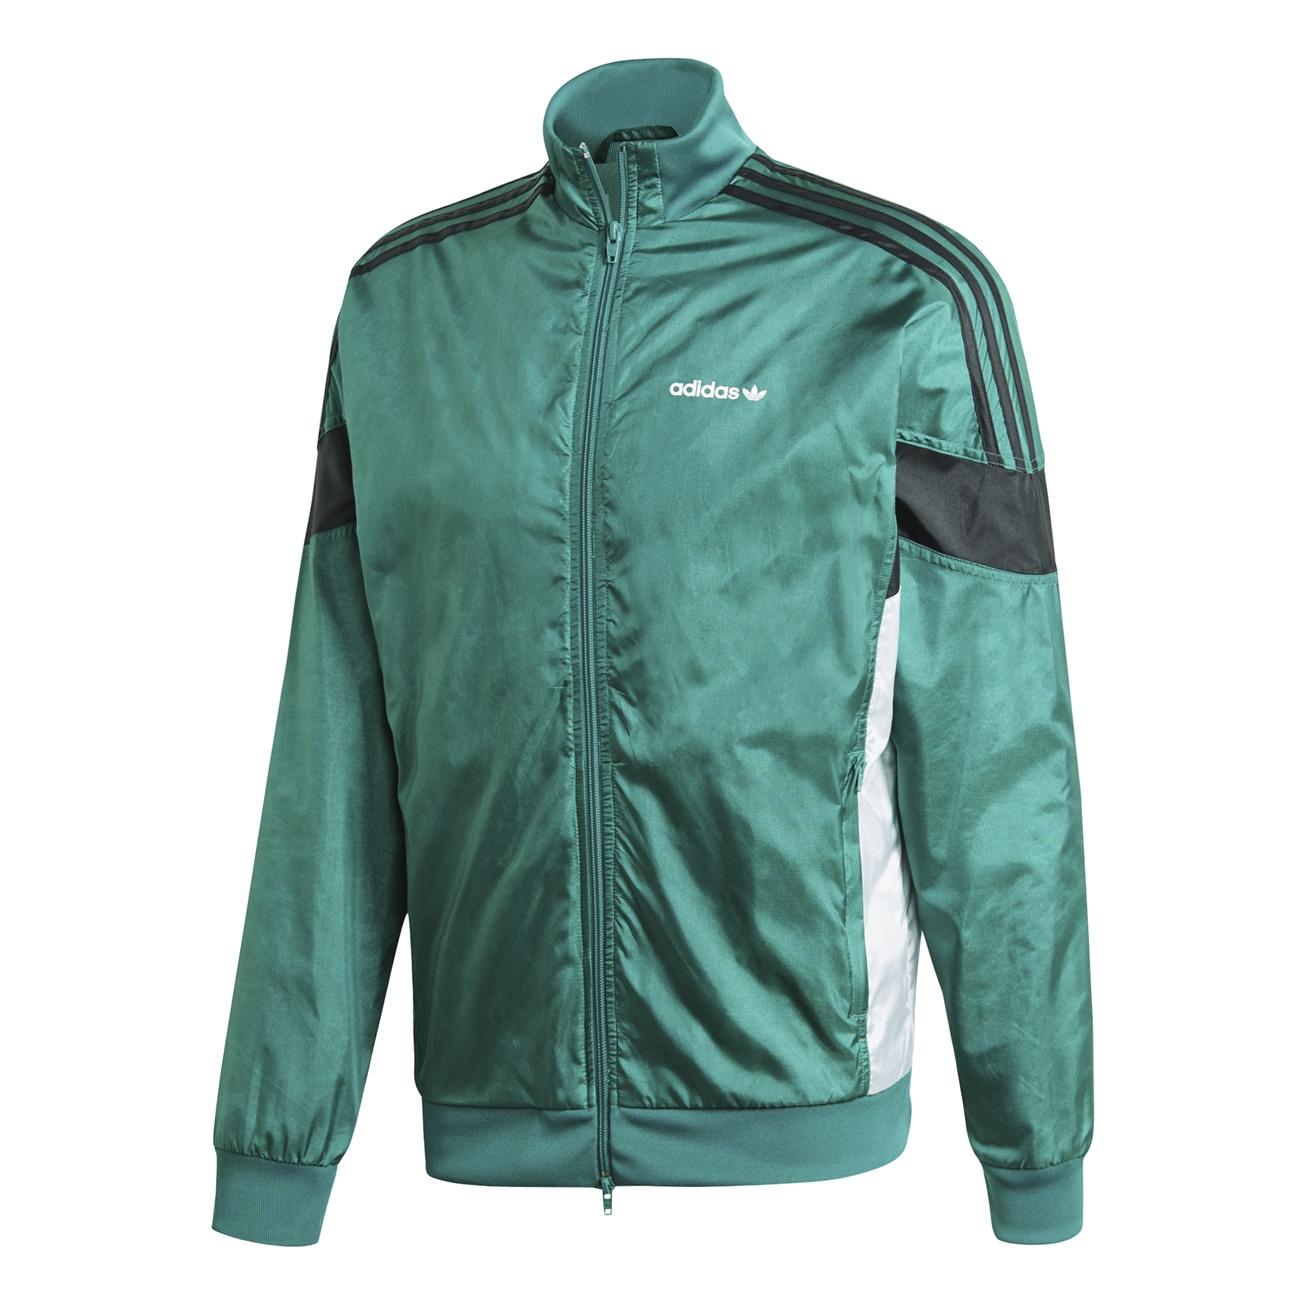 adidas jacket originals